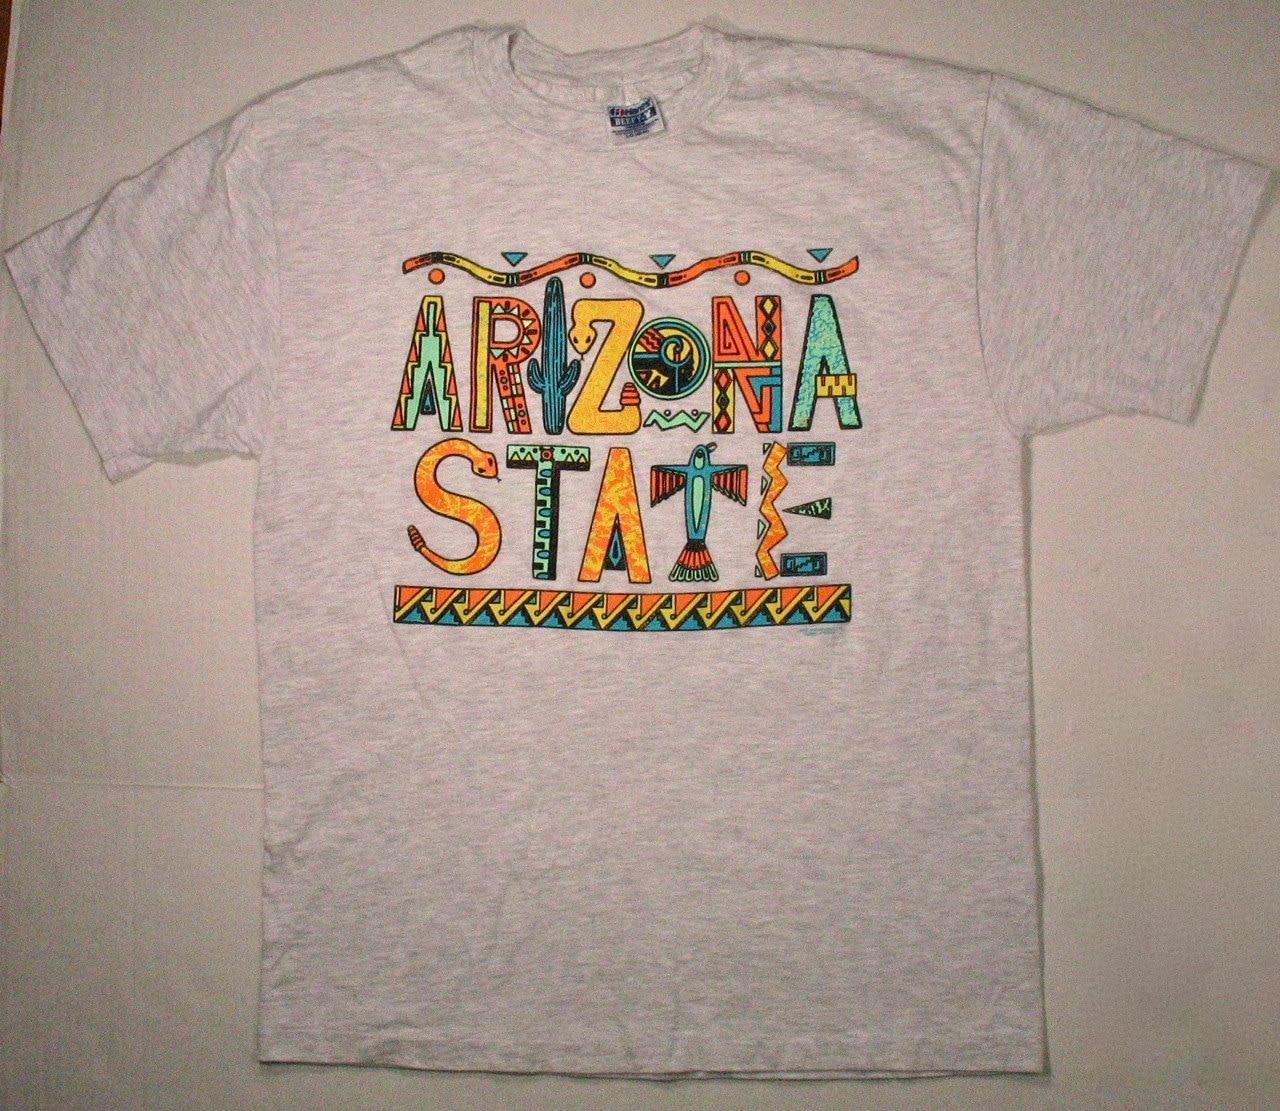 90s arizona state t shirt puff paint design college university Puffy paint shirt designs